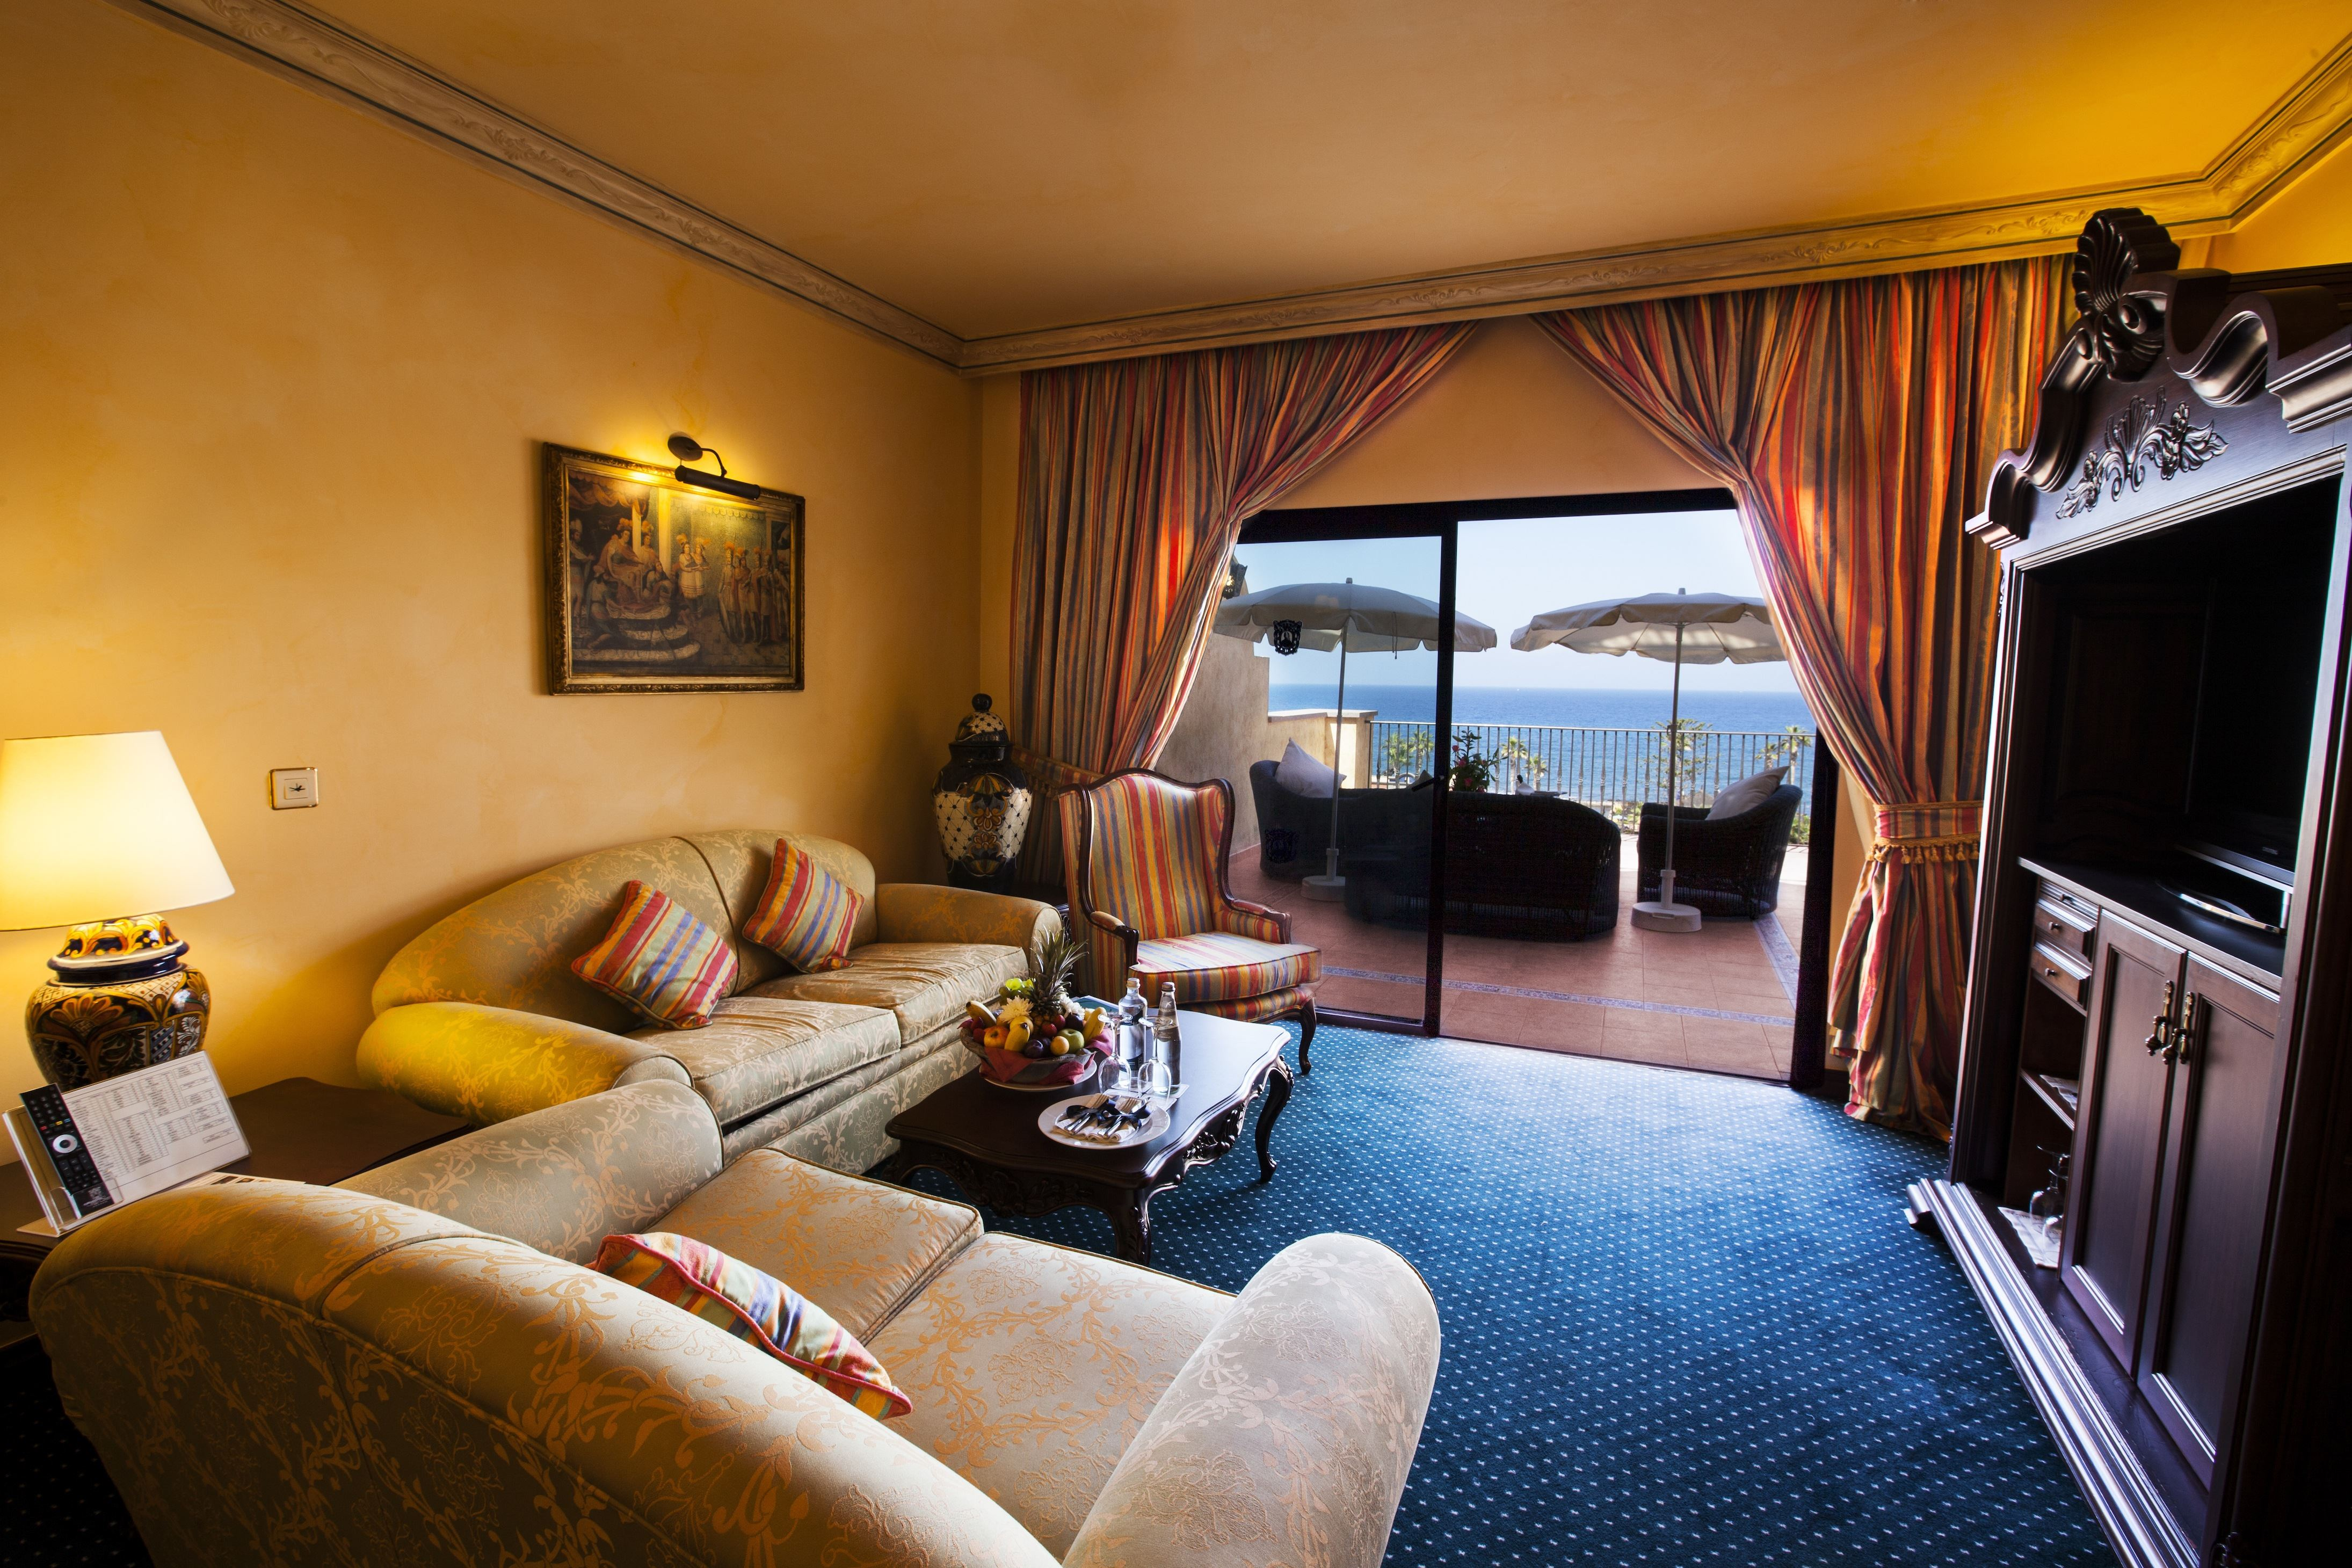 Svit på Hotell Villa Cortes, Playa de Las Américas Teneriffa